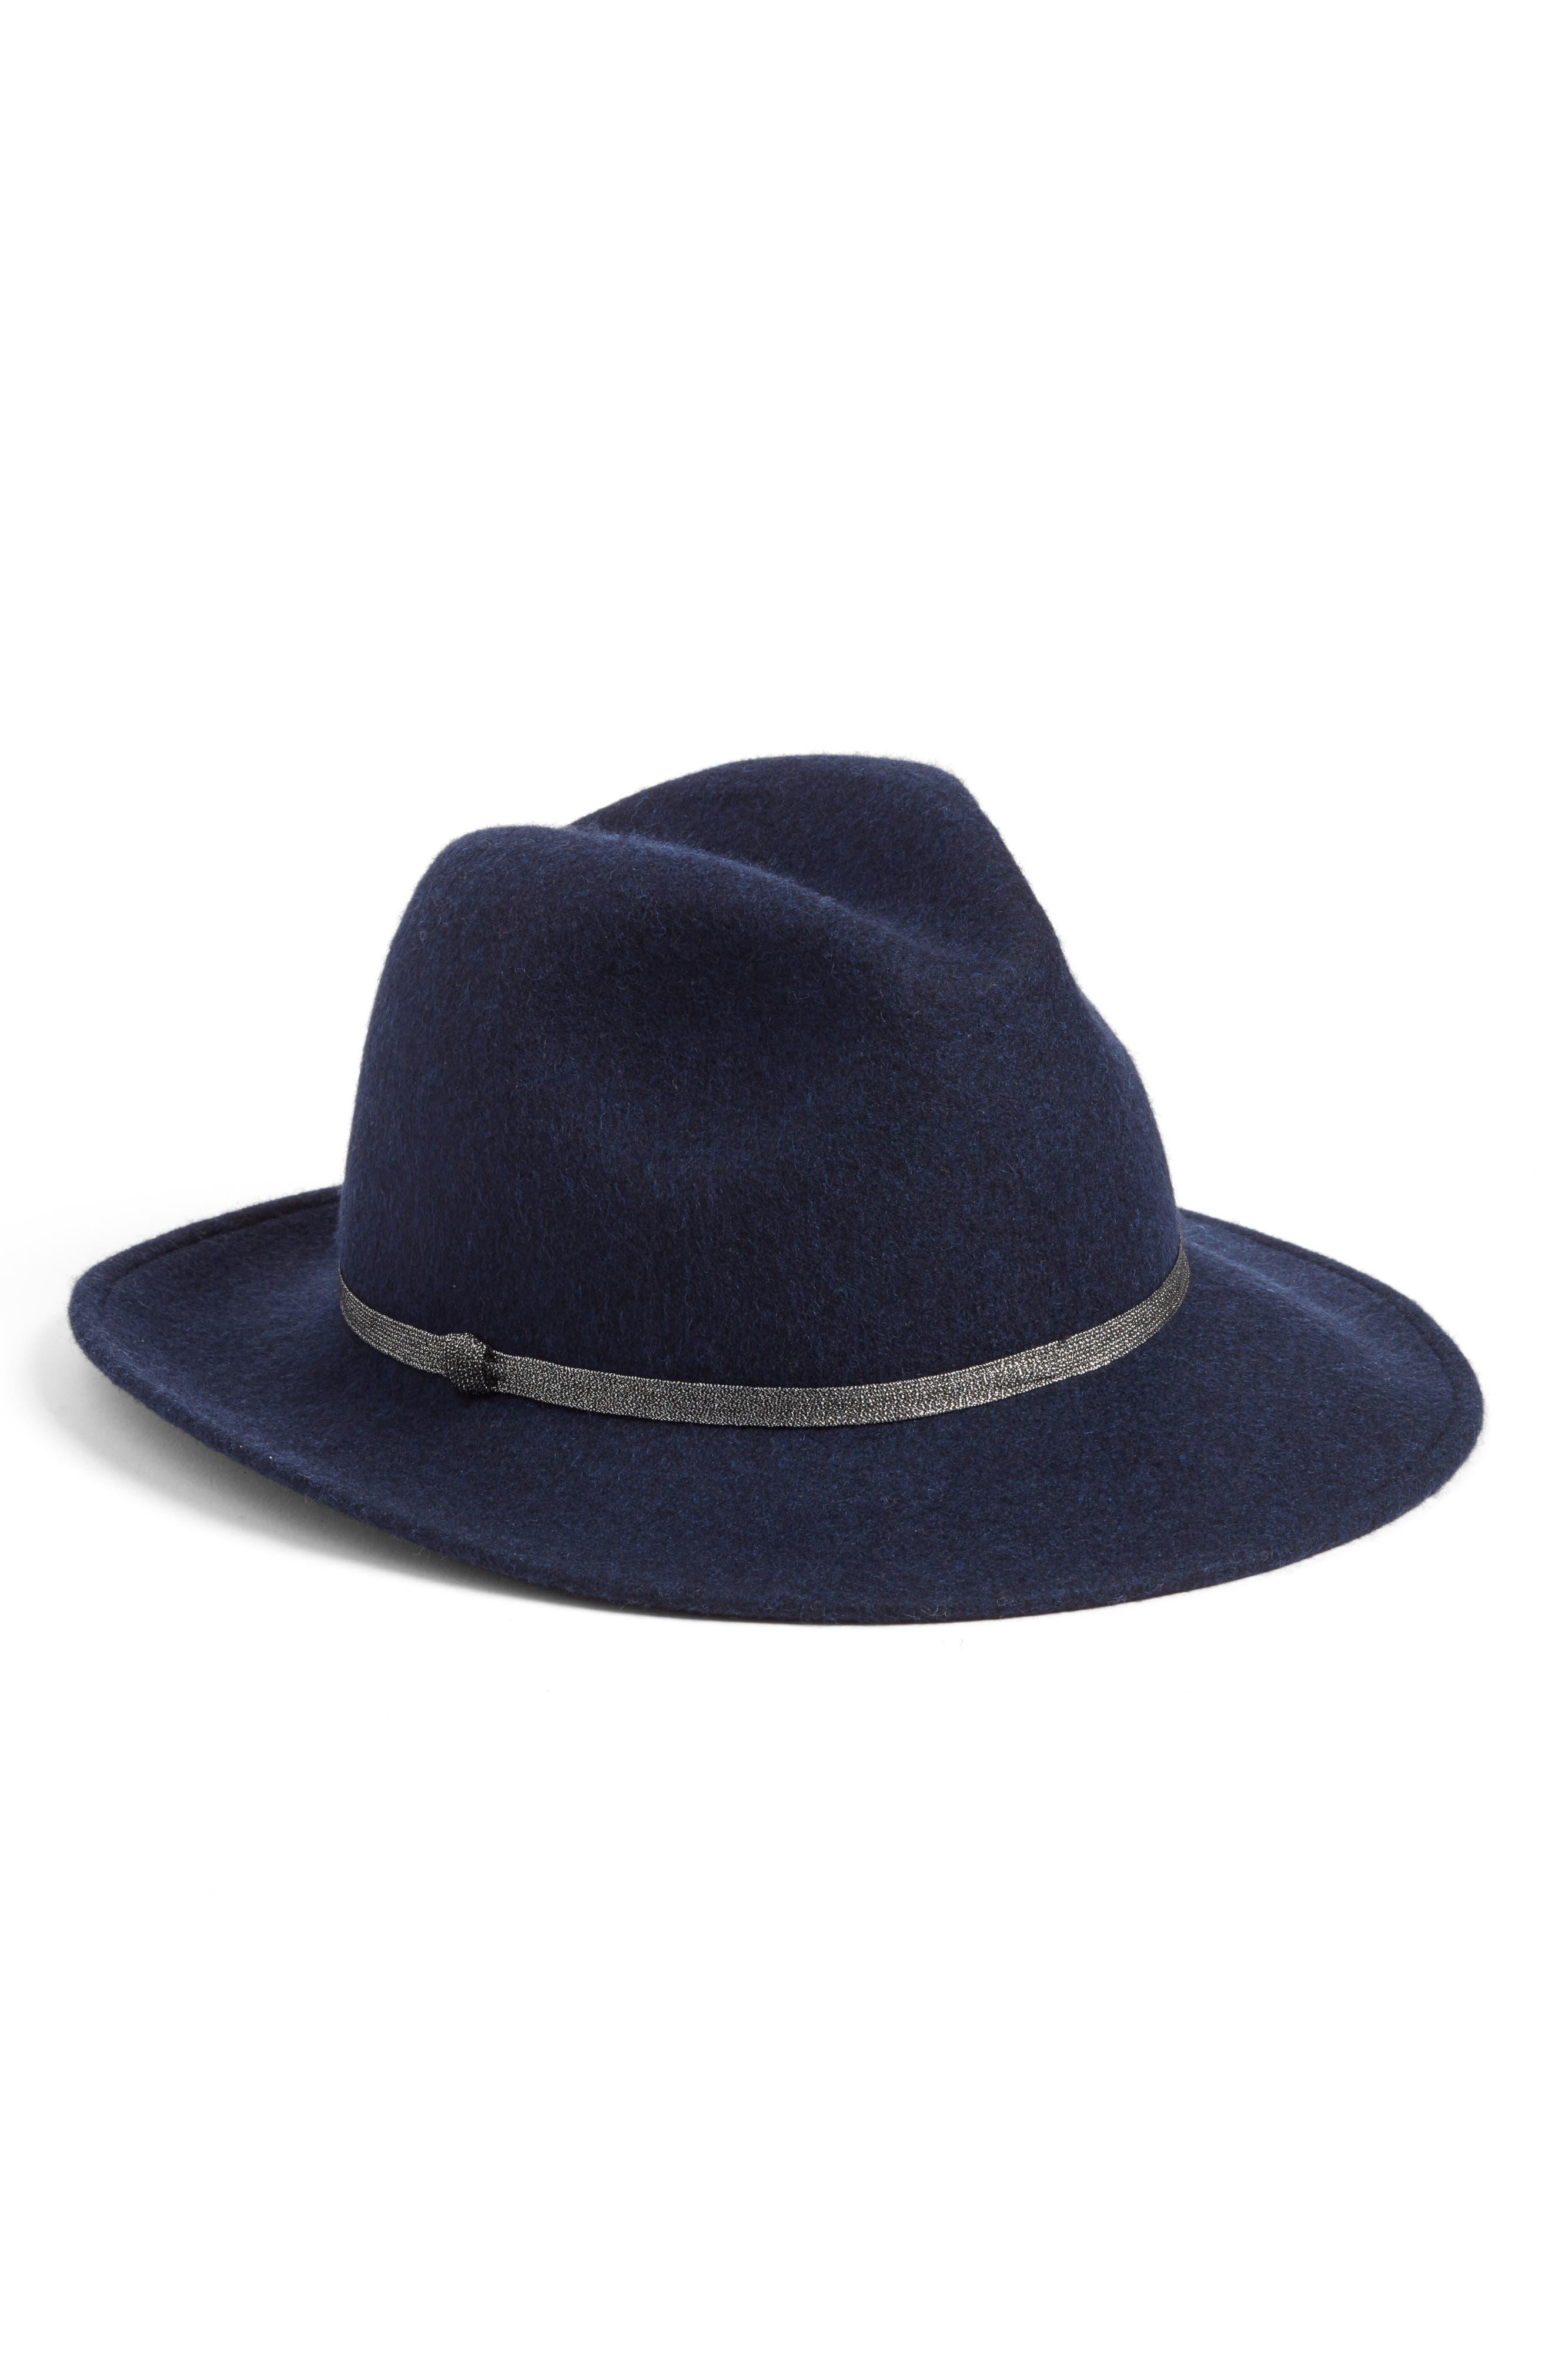 Metallic Band Wool Felt Panama Hat,                             Main thumbnail 4, color,